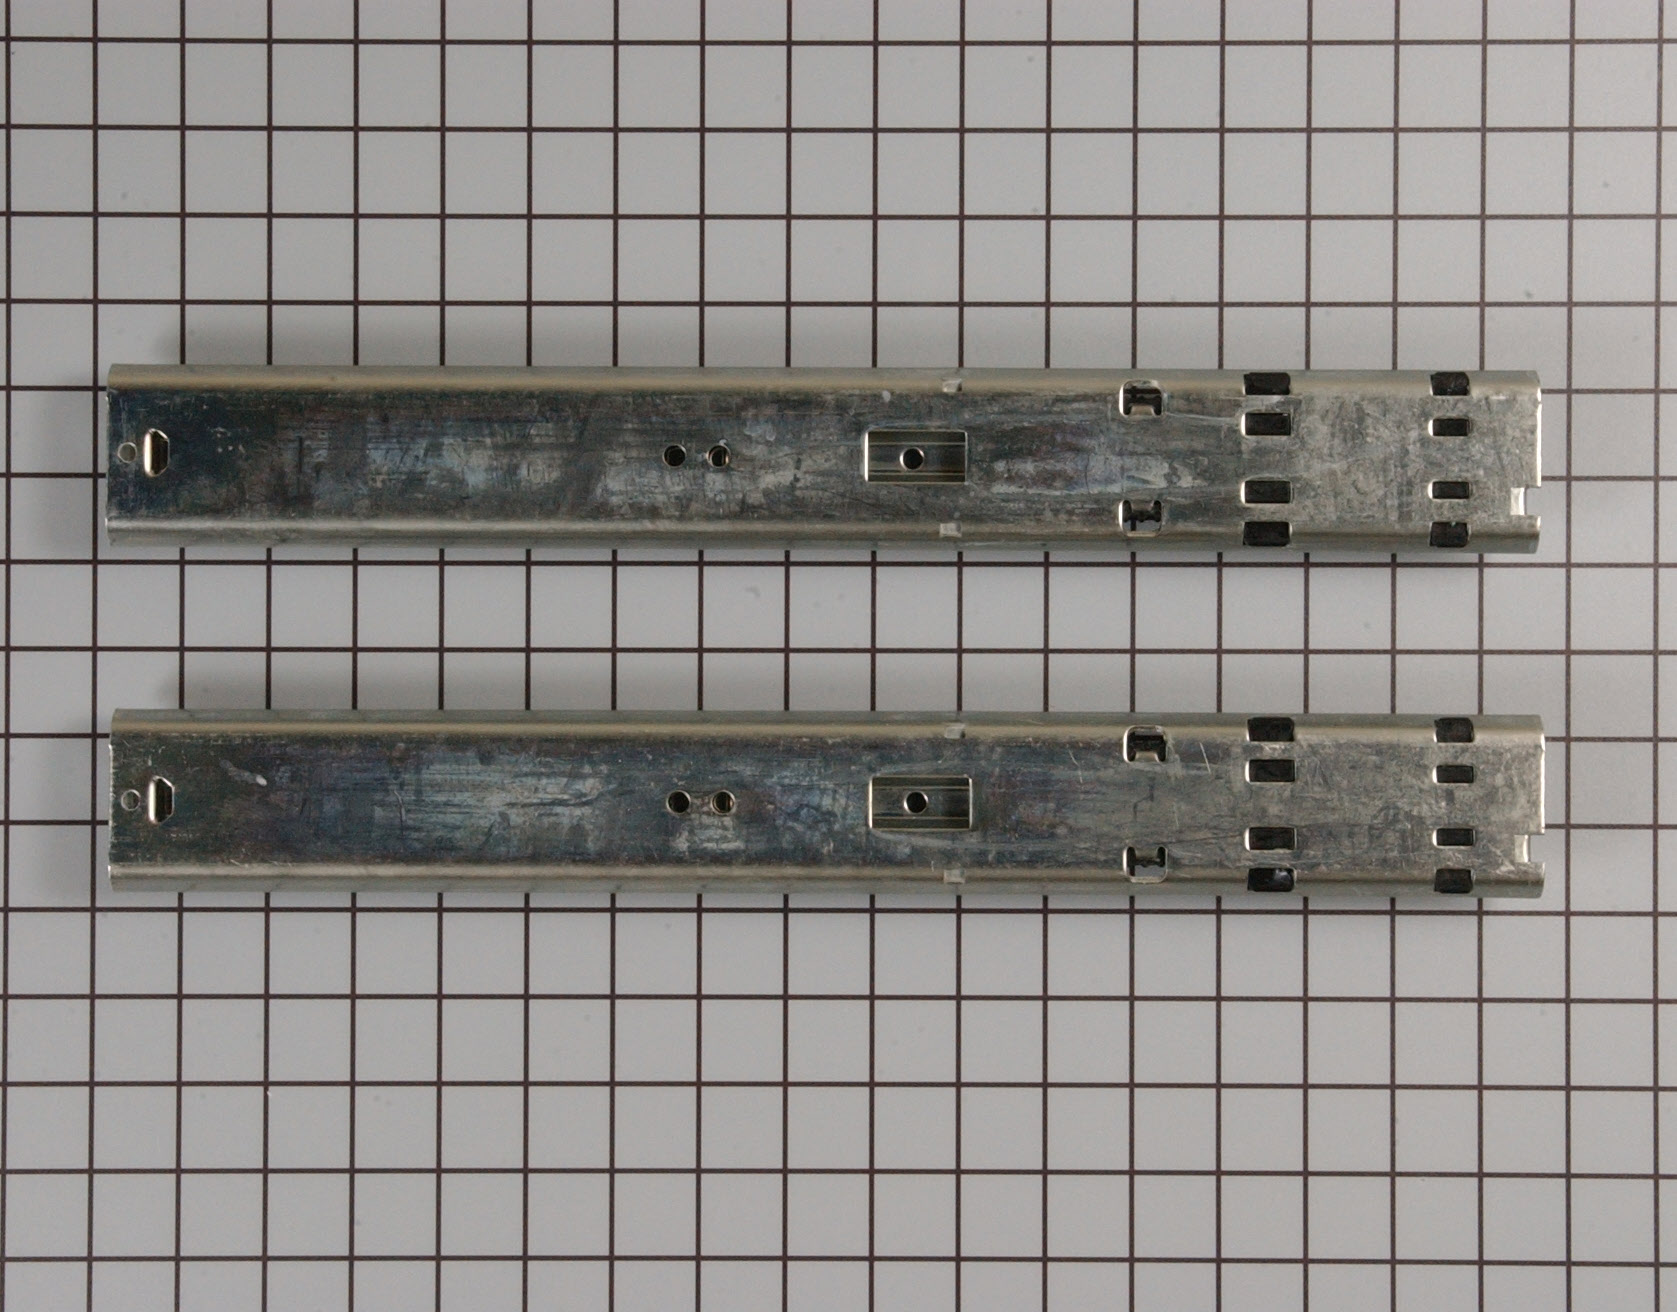 12002684 KitchenAid Refrigerator Part -Drawer Slide Rail